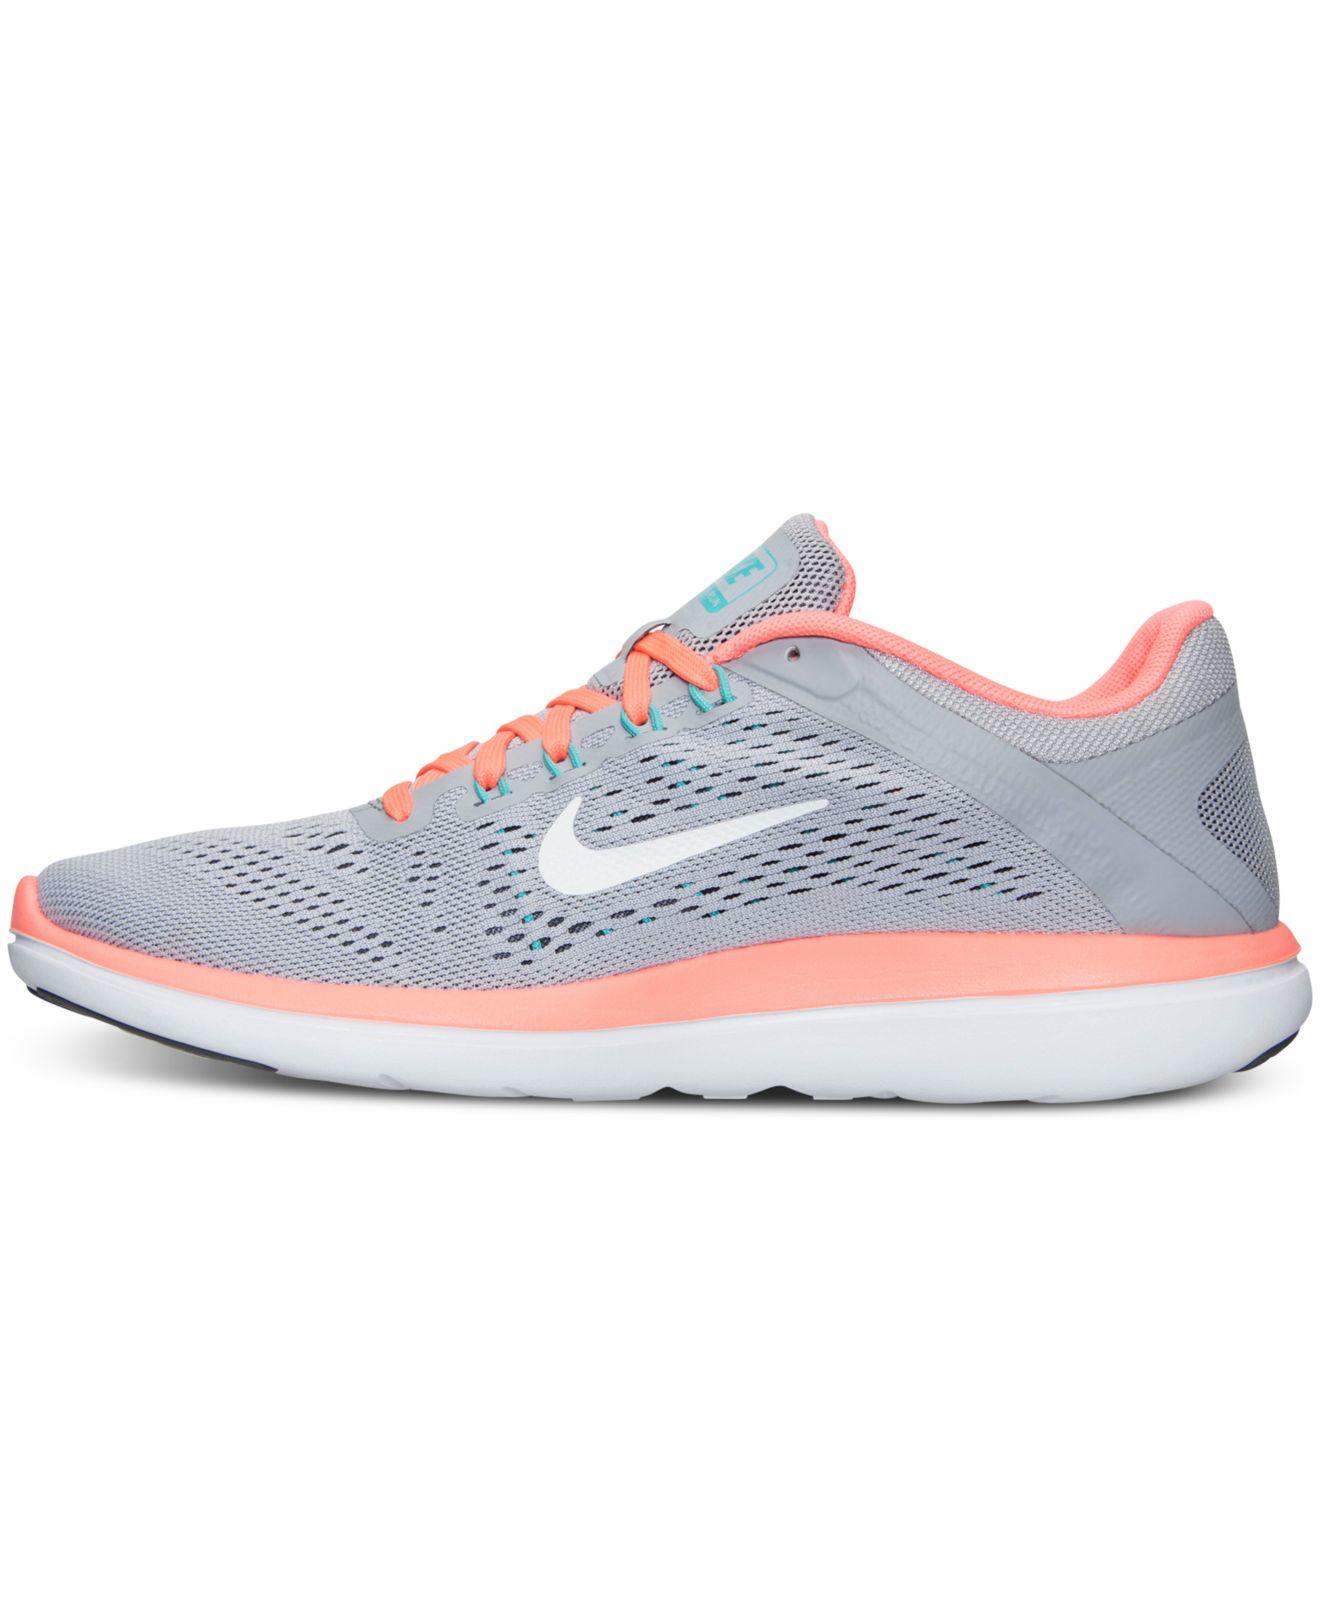 Womens Running Shoes Macys